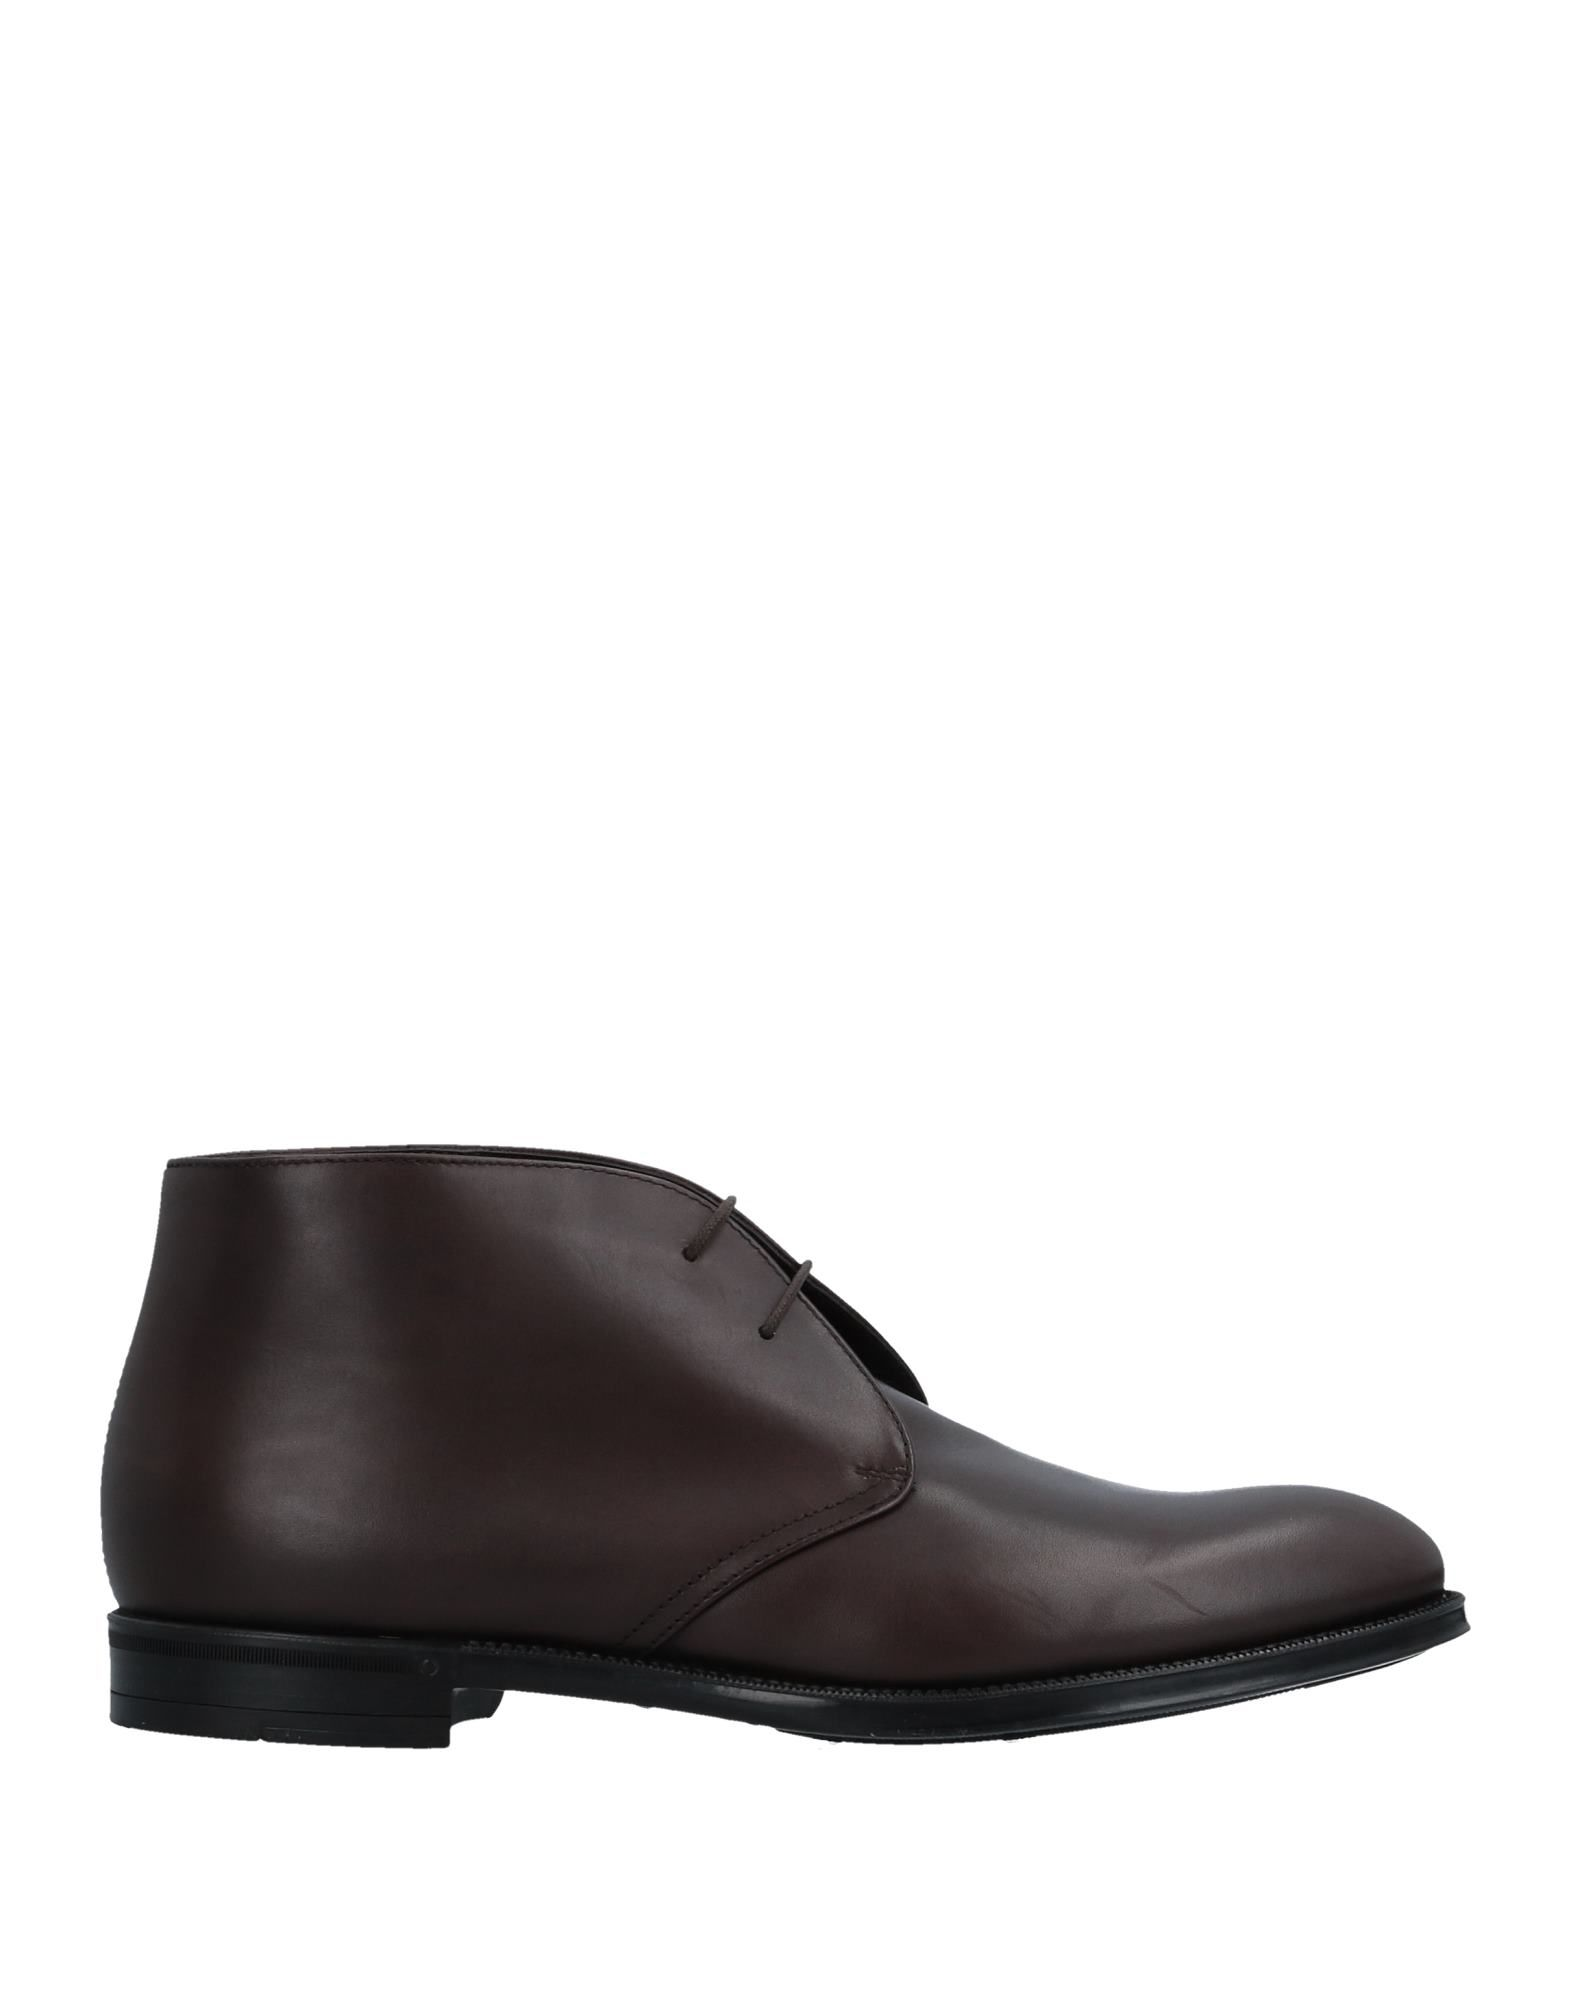 Doucal's Stiefelette Herren  11508936VW Gute Qualität beliebte Schuhe